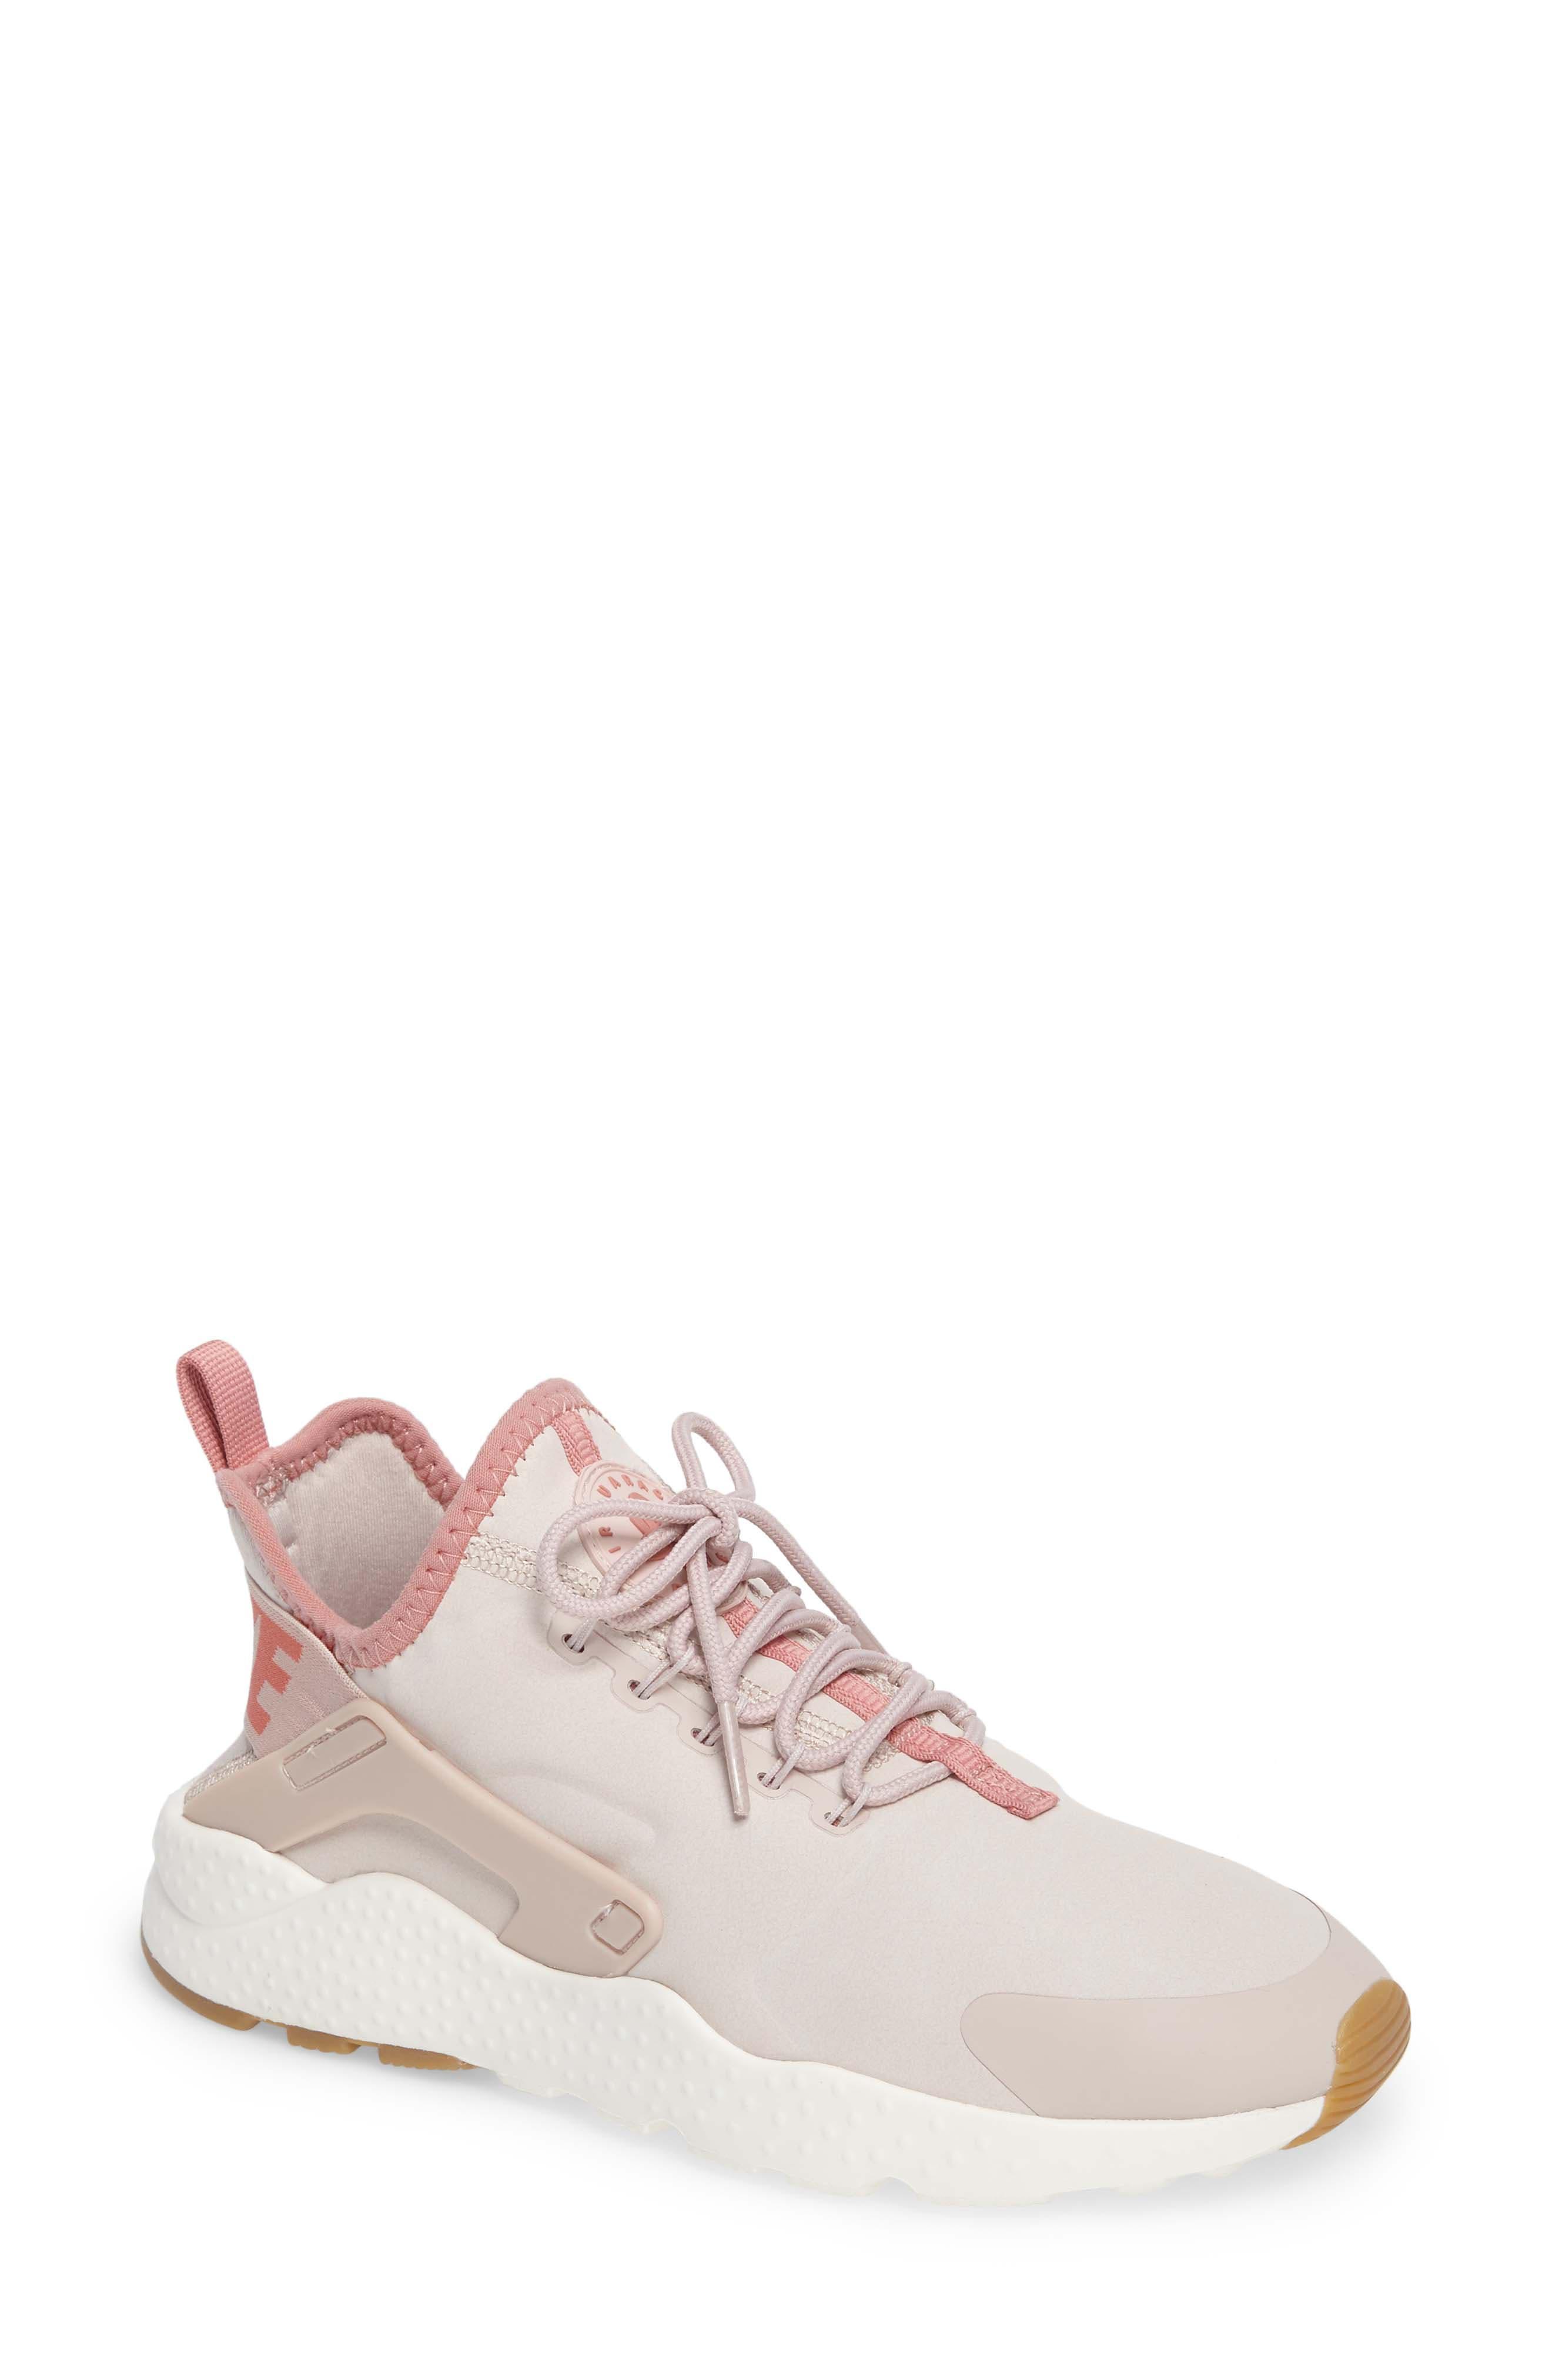 Nike Air Huarache Run Ultra Premium Sneaker (Women)